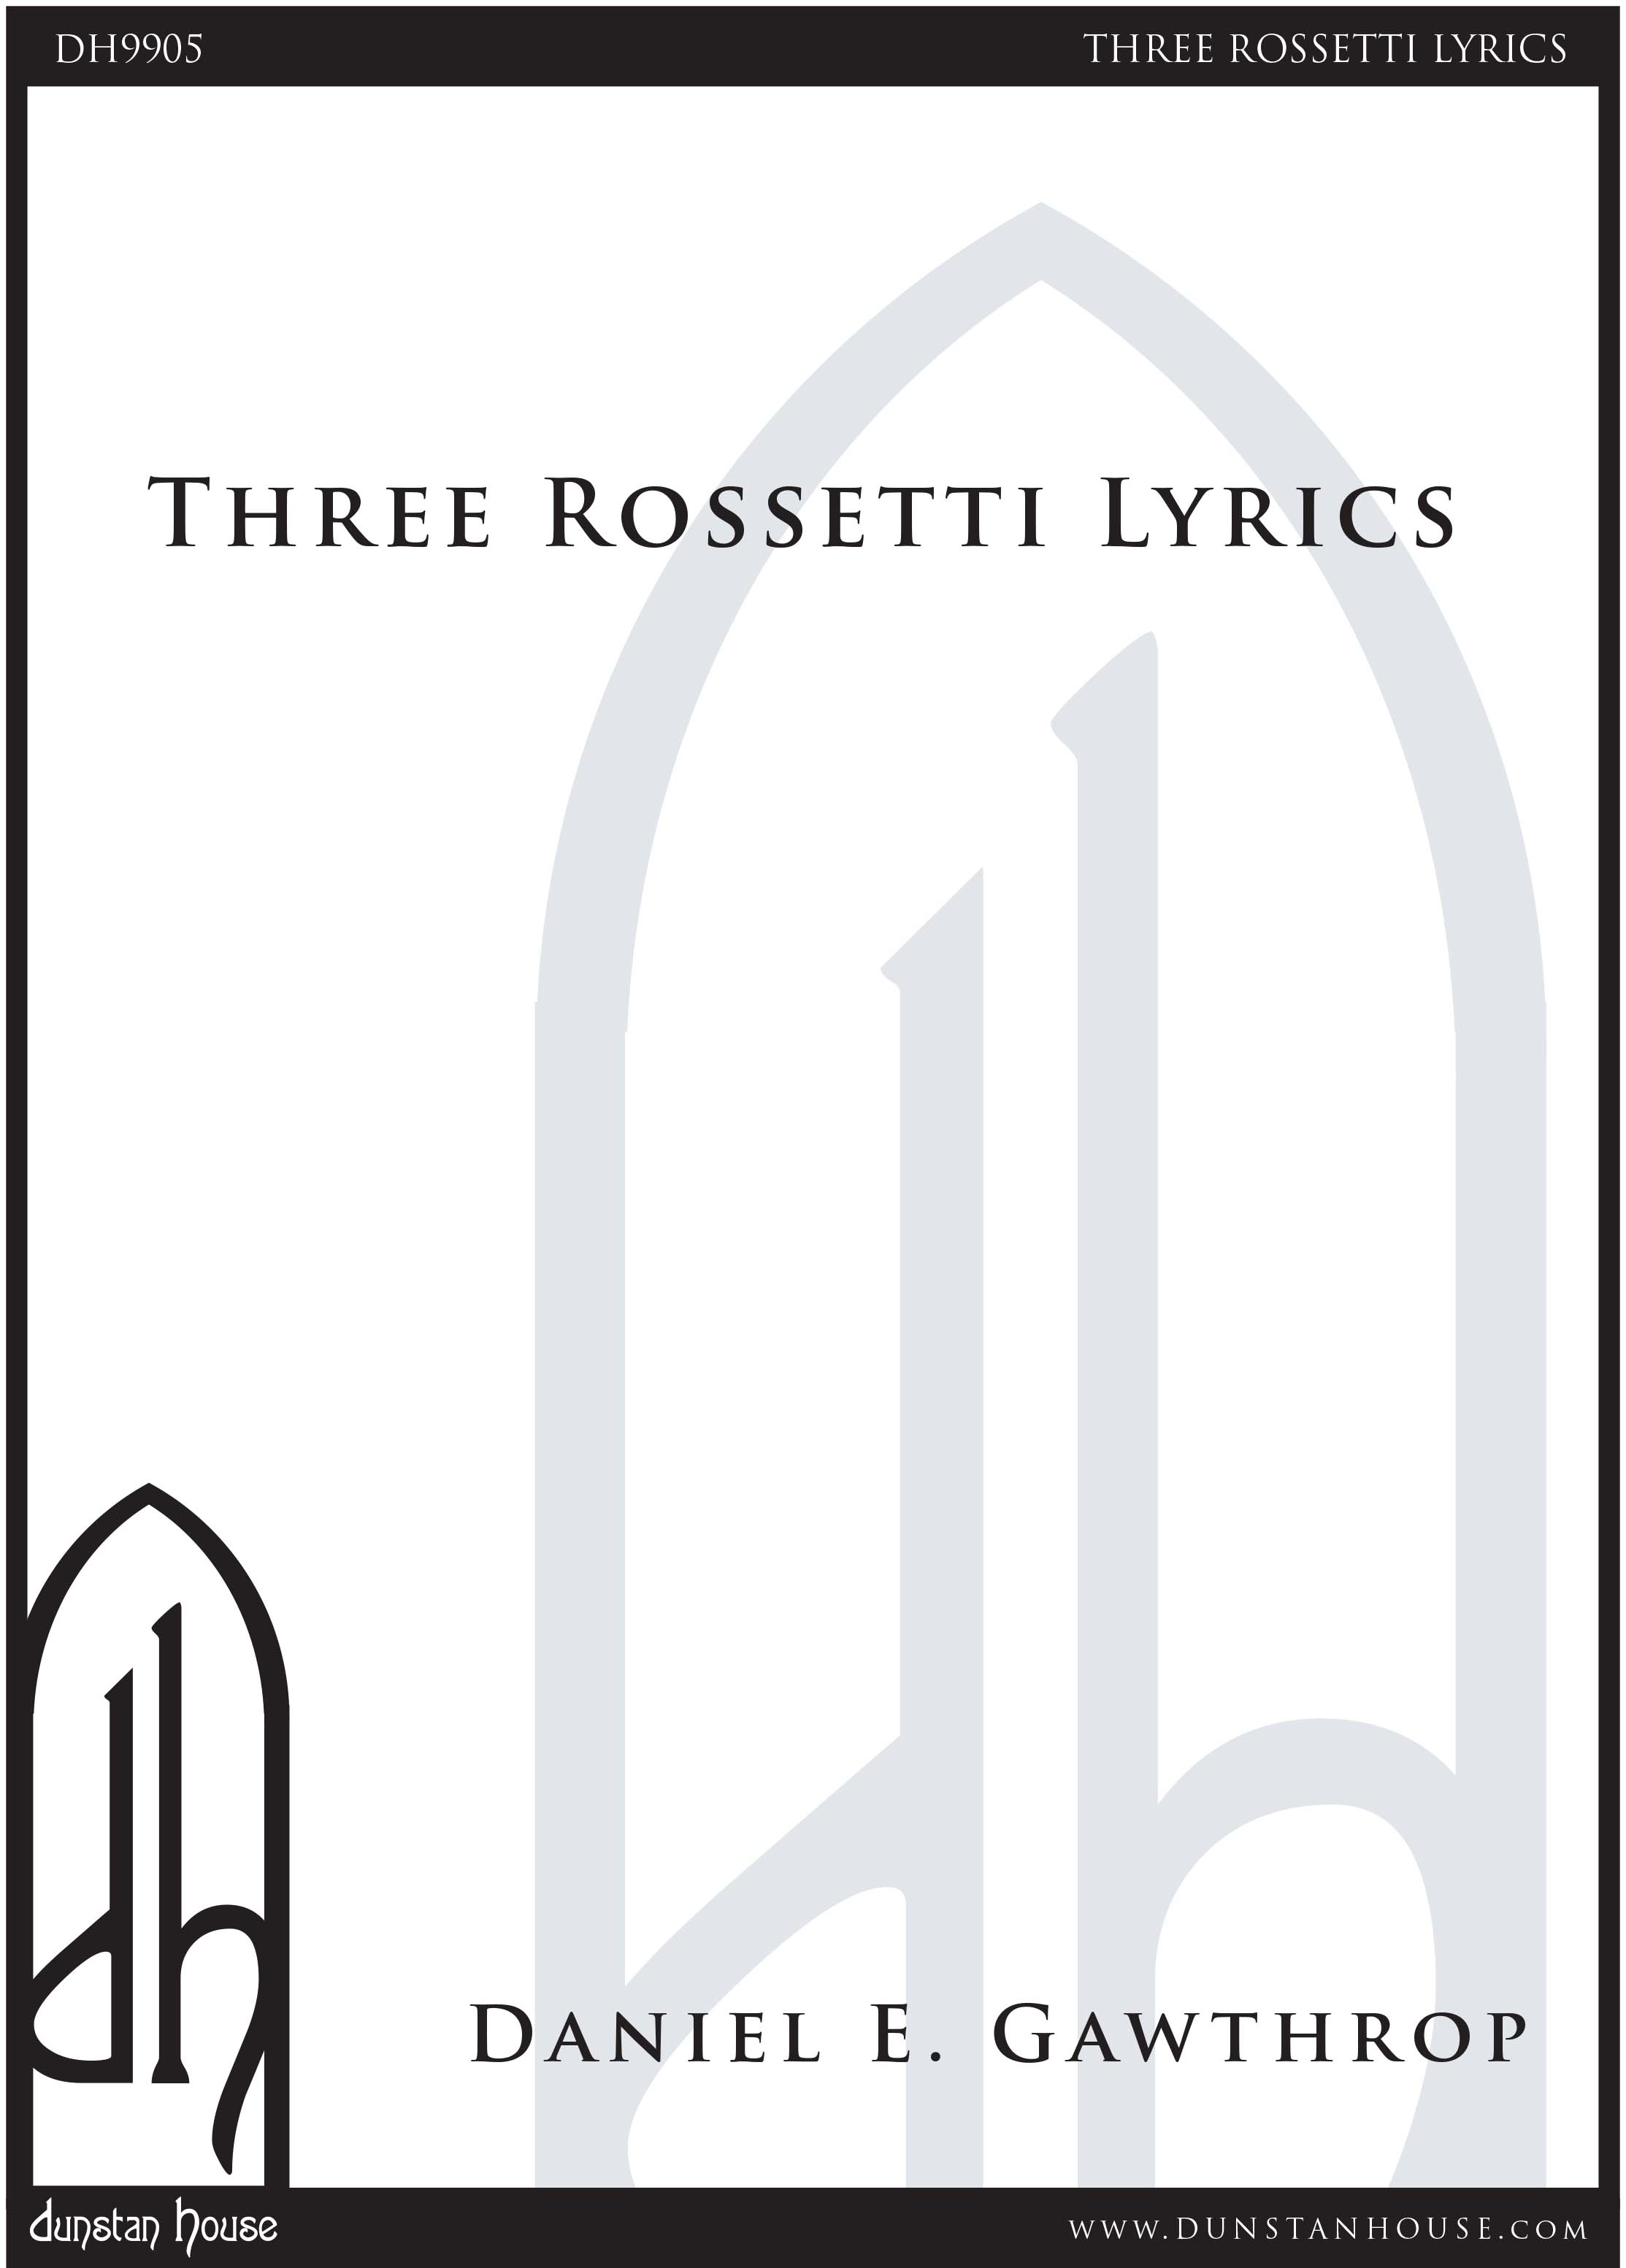 Three Rossetti Lyrics